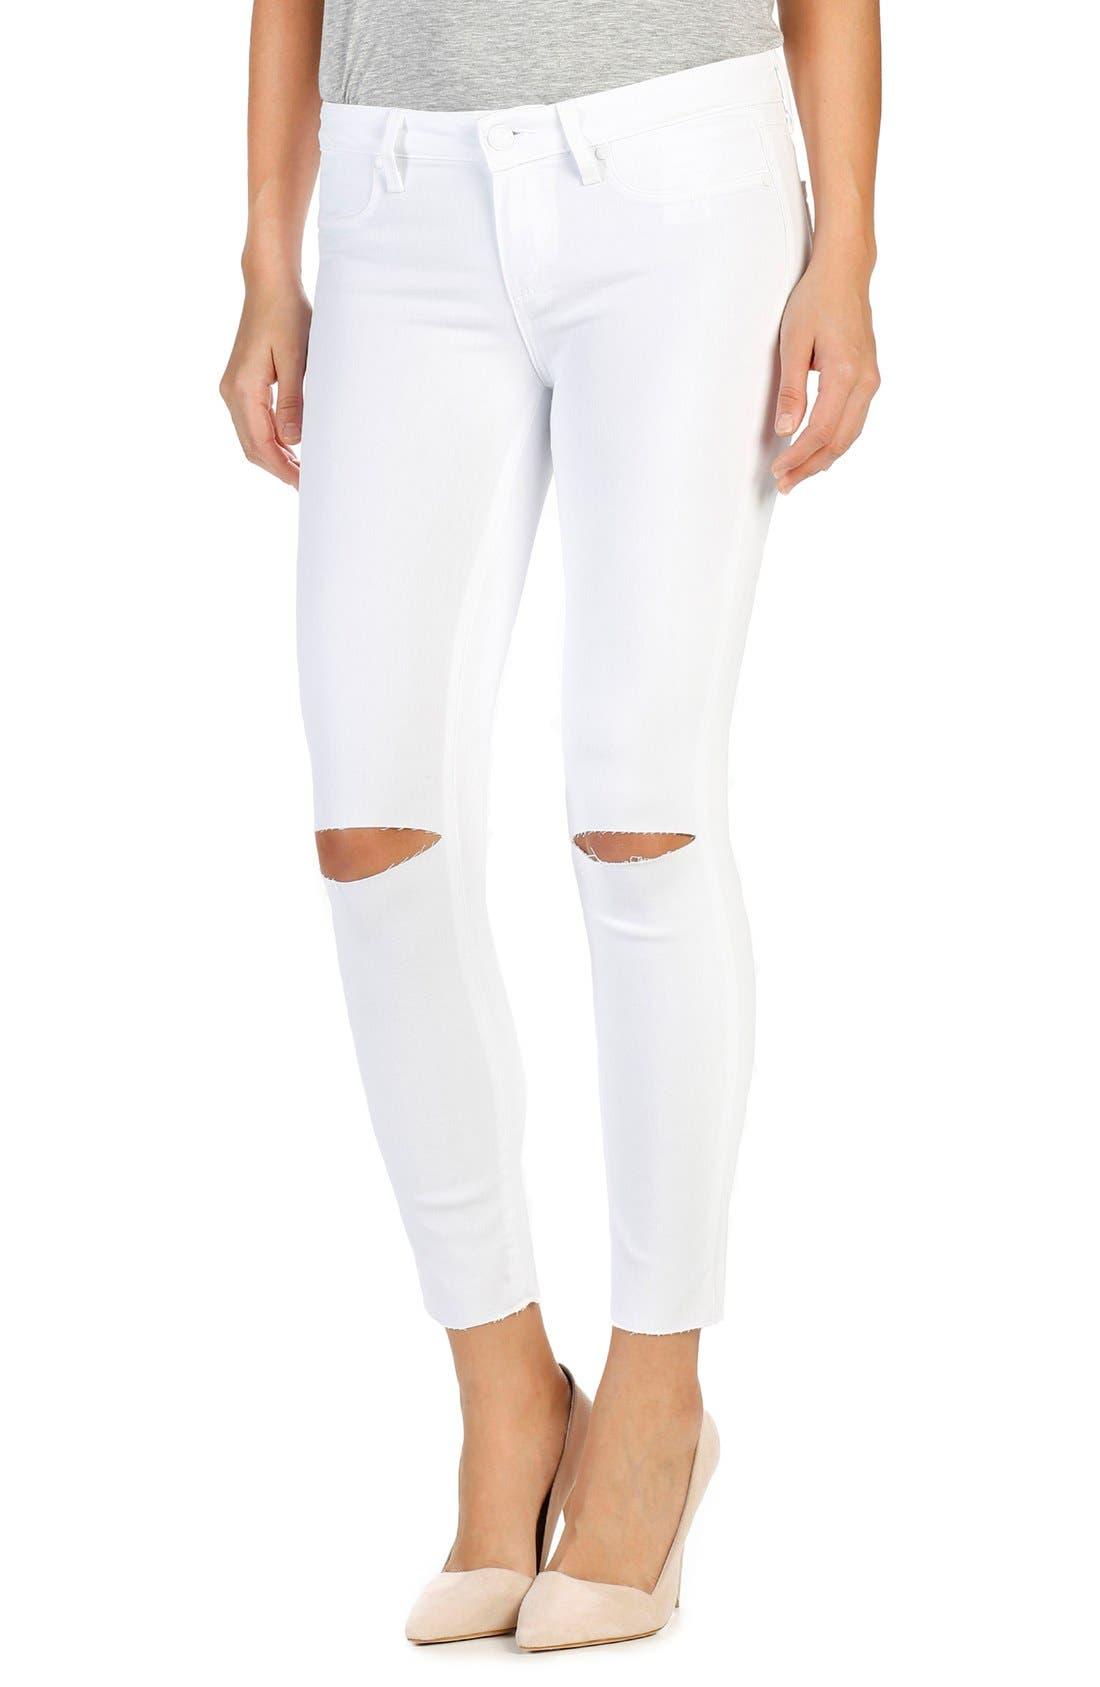 Transcend - Verdugo Ankle Skinny Jeans,                         Main,                         color, White Cloud Destructed